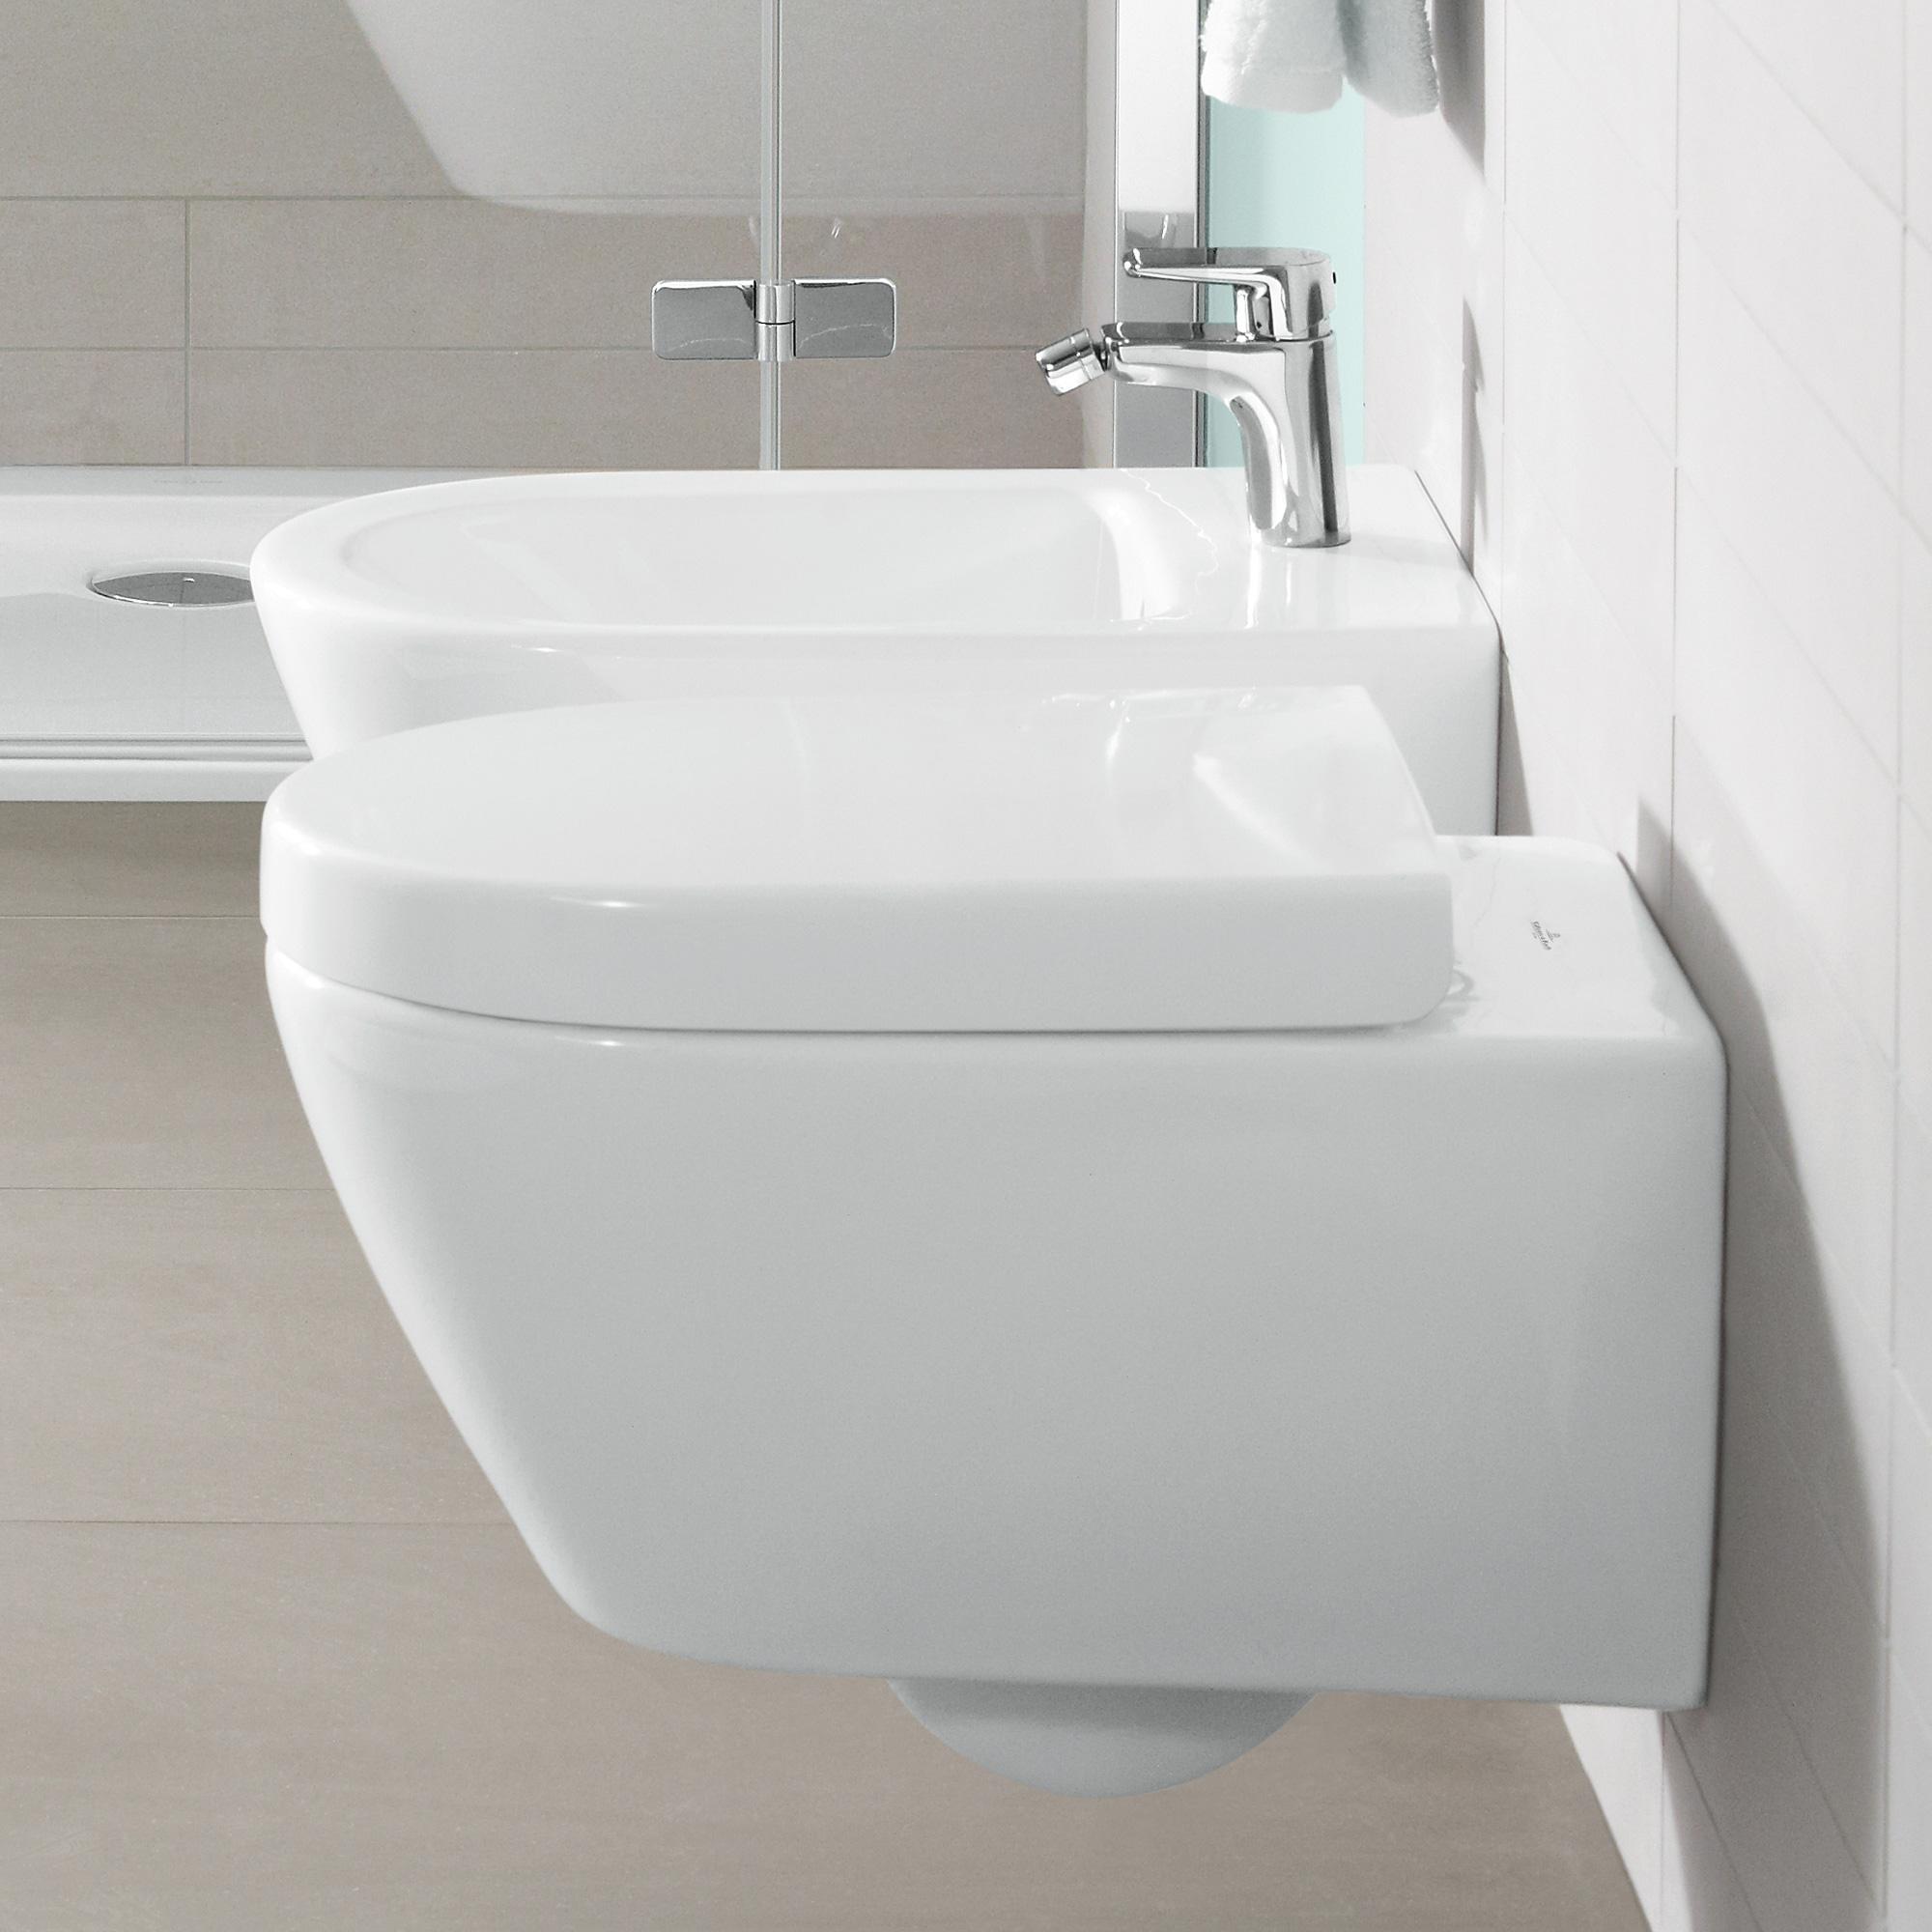 villeroy boch subway 2 0 tiefsp l wand wc l 56 b 37 cm starwhite ceramicplus 560010r2. Black Bedroom Furniture Sets. Home Design Ideas